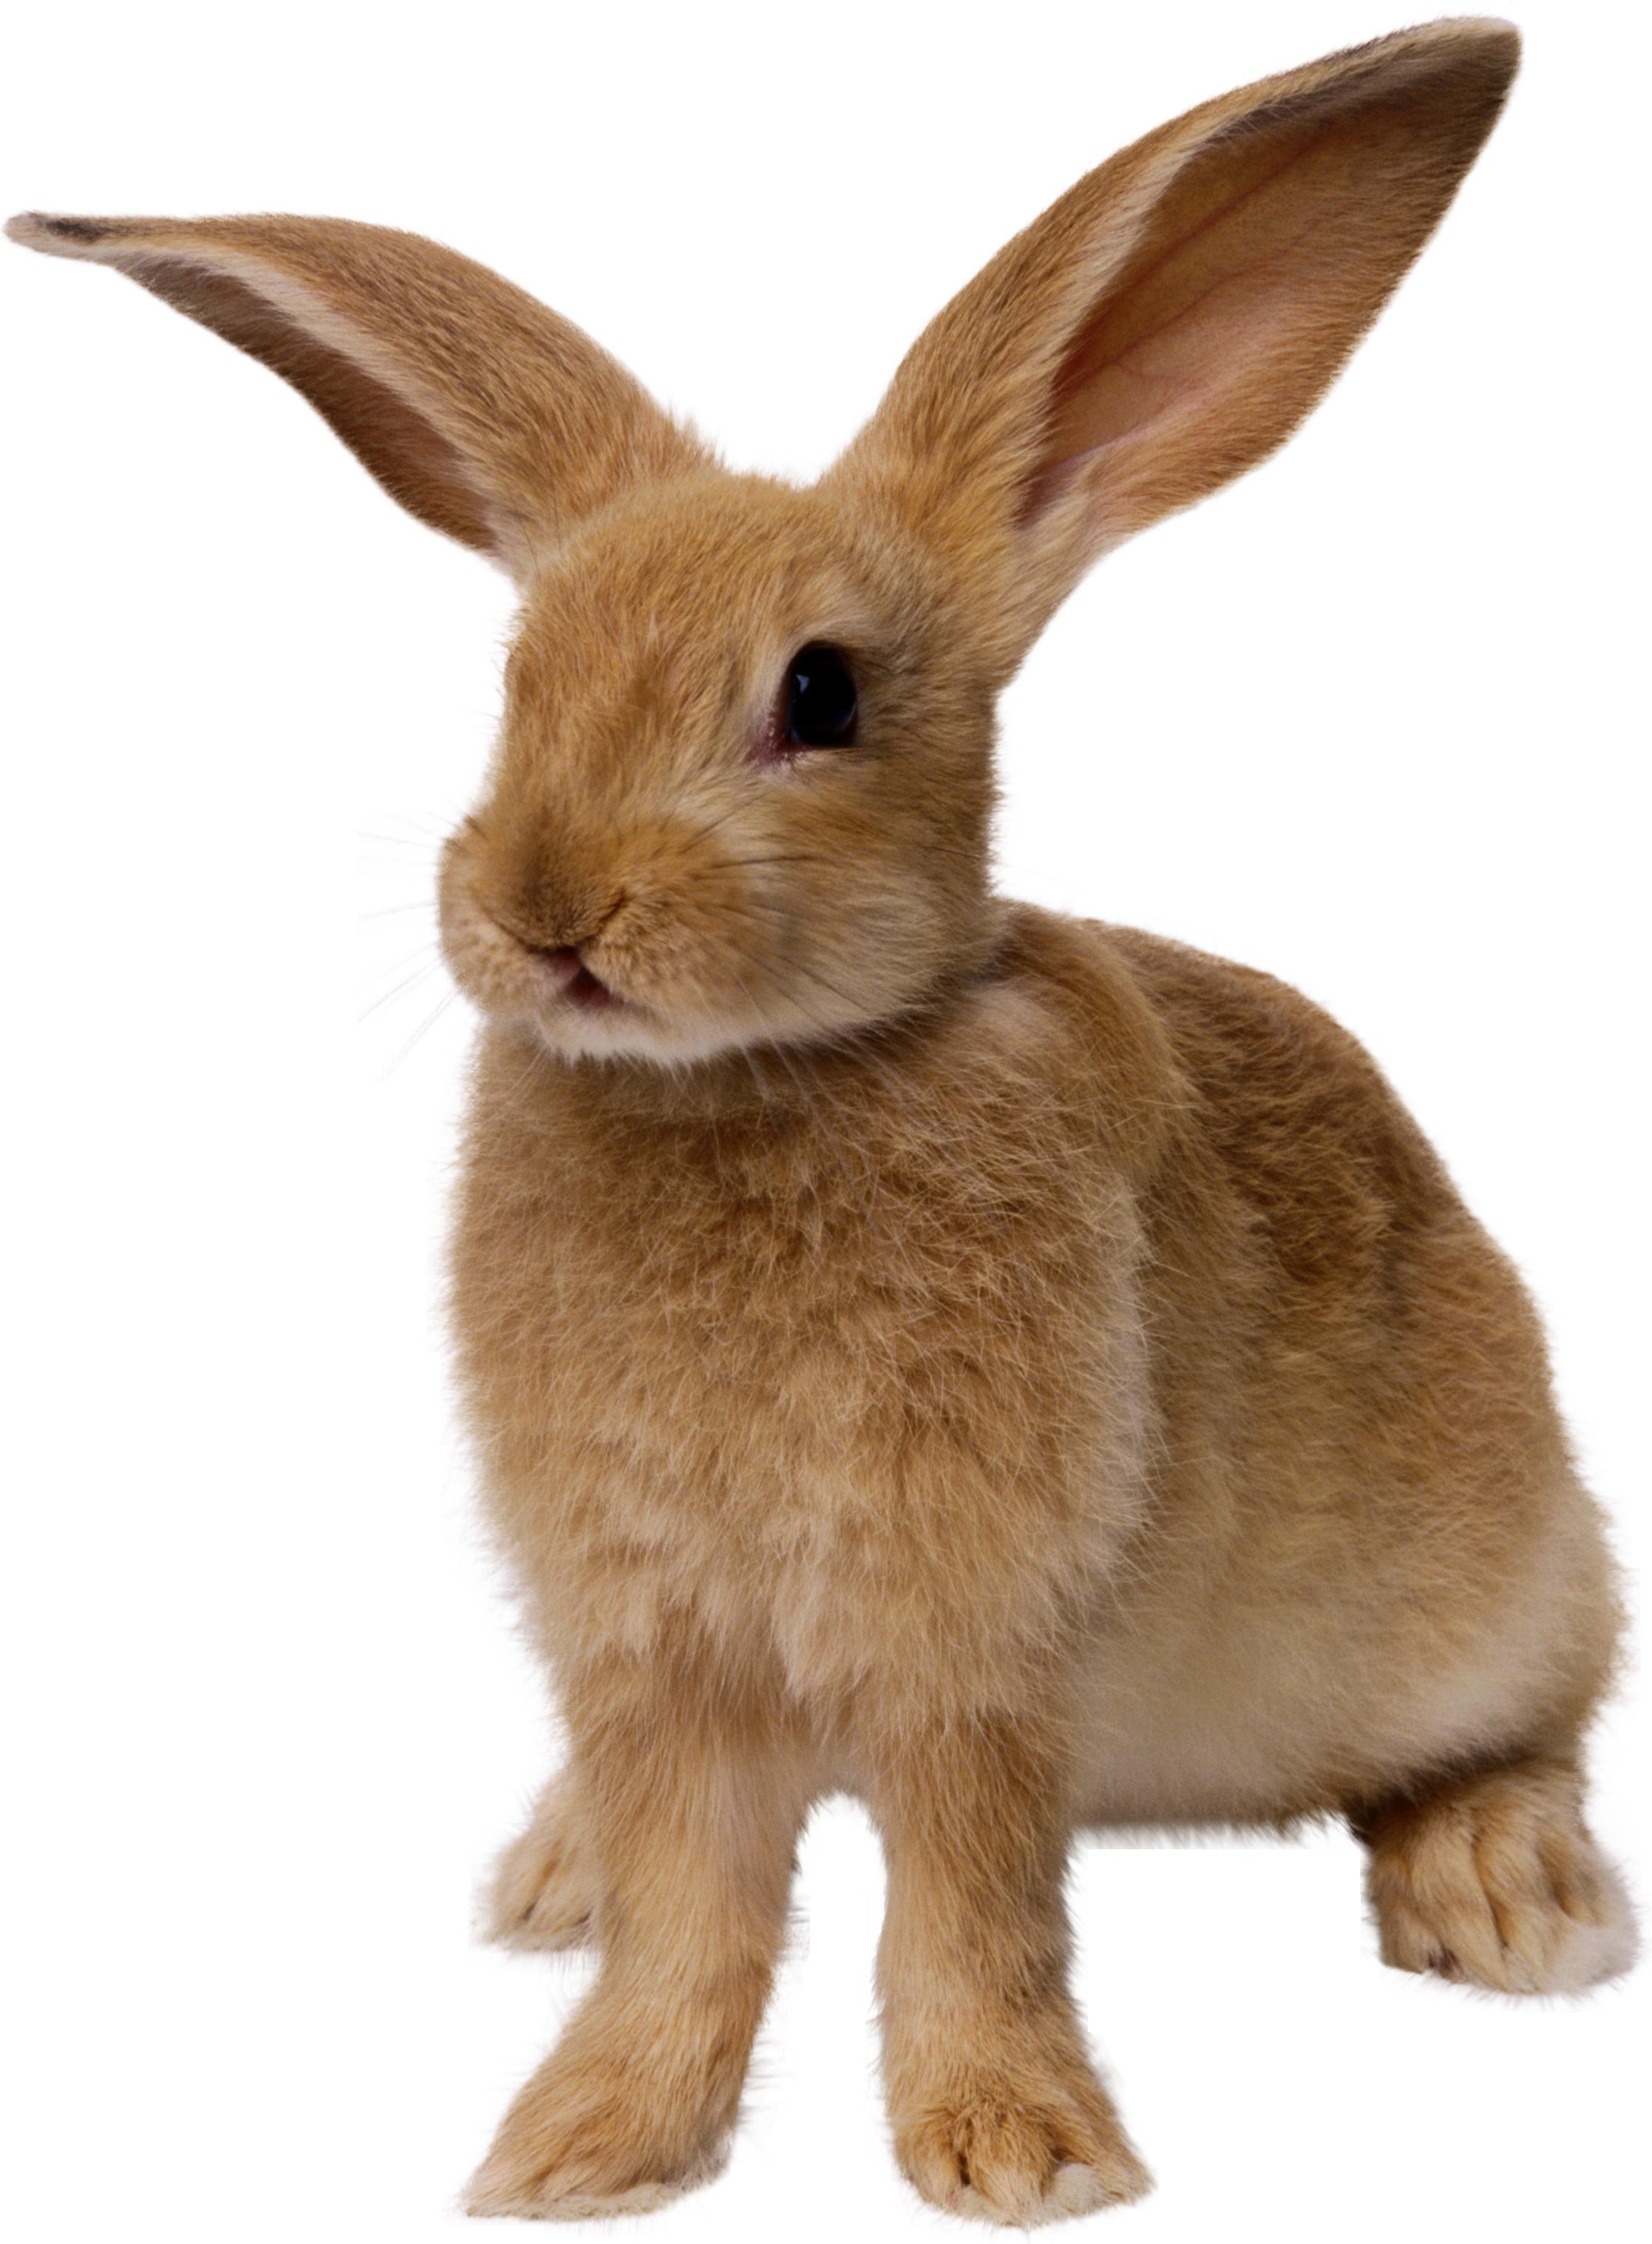 Rabbit PNG Image - Rabbit HD PNG